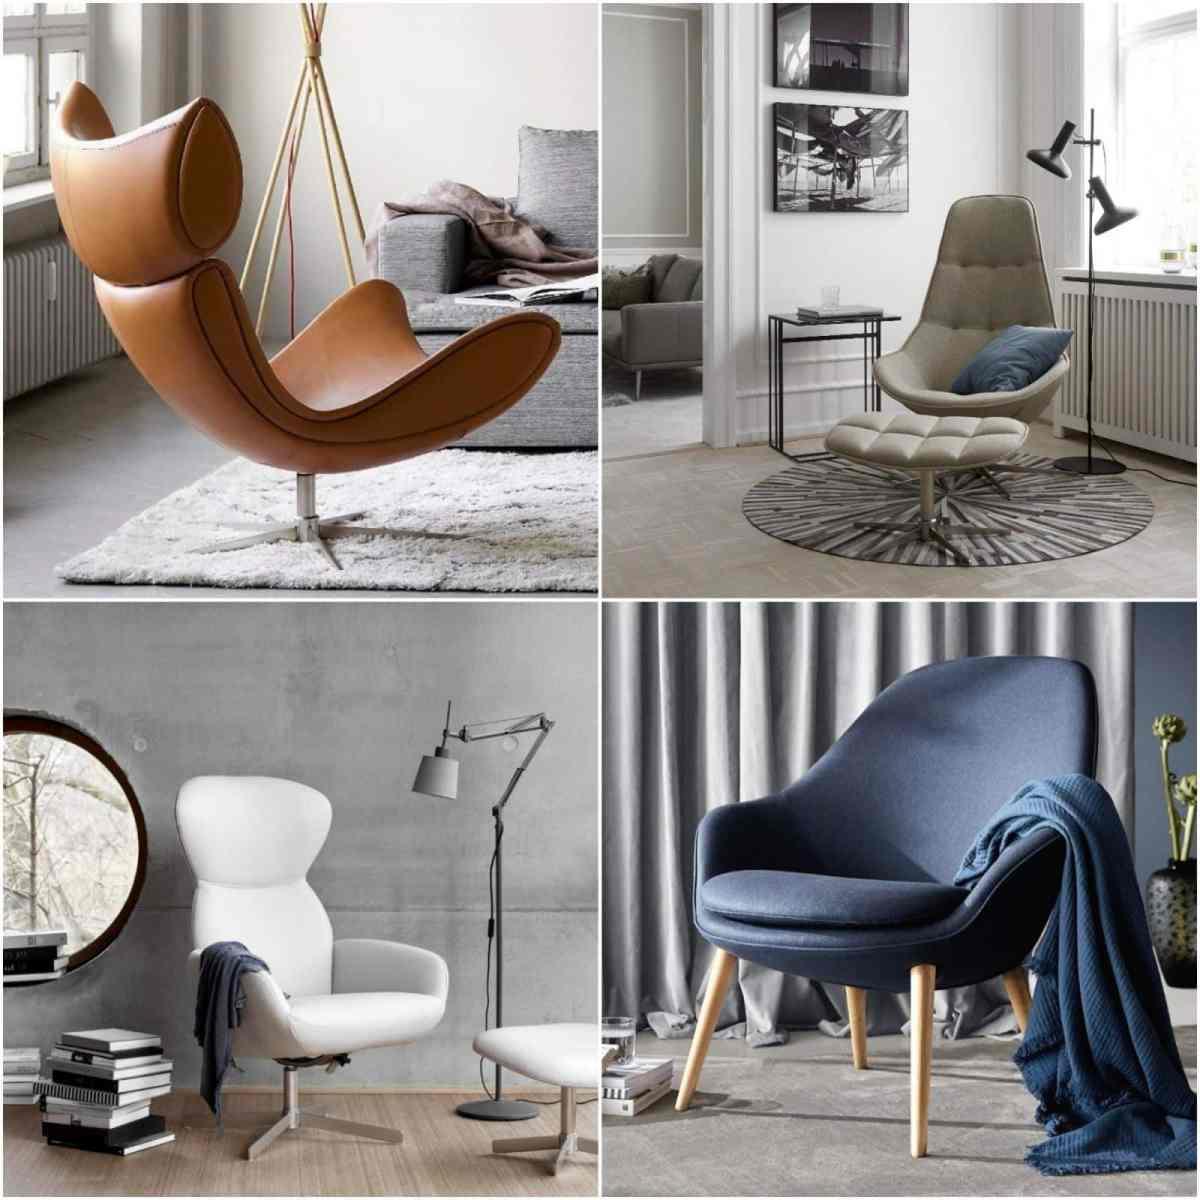 boconcept experience sessel - RENO - Sessel Design mit Komfort